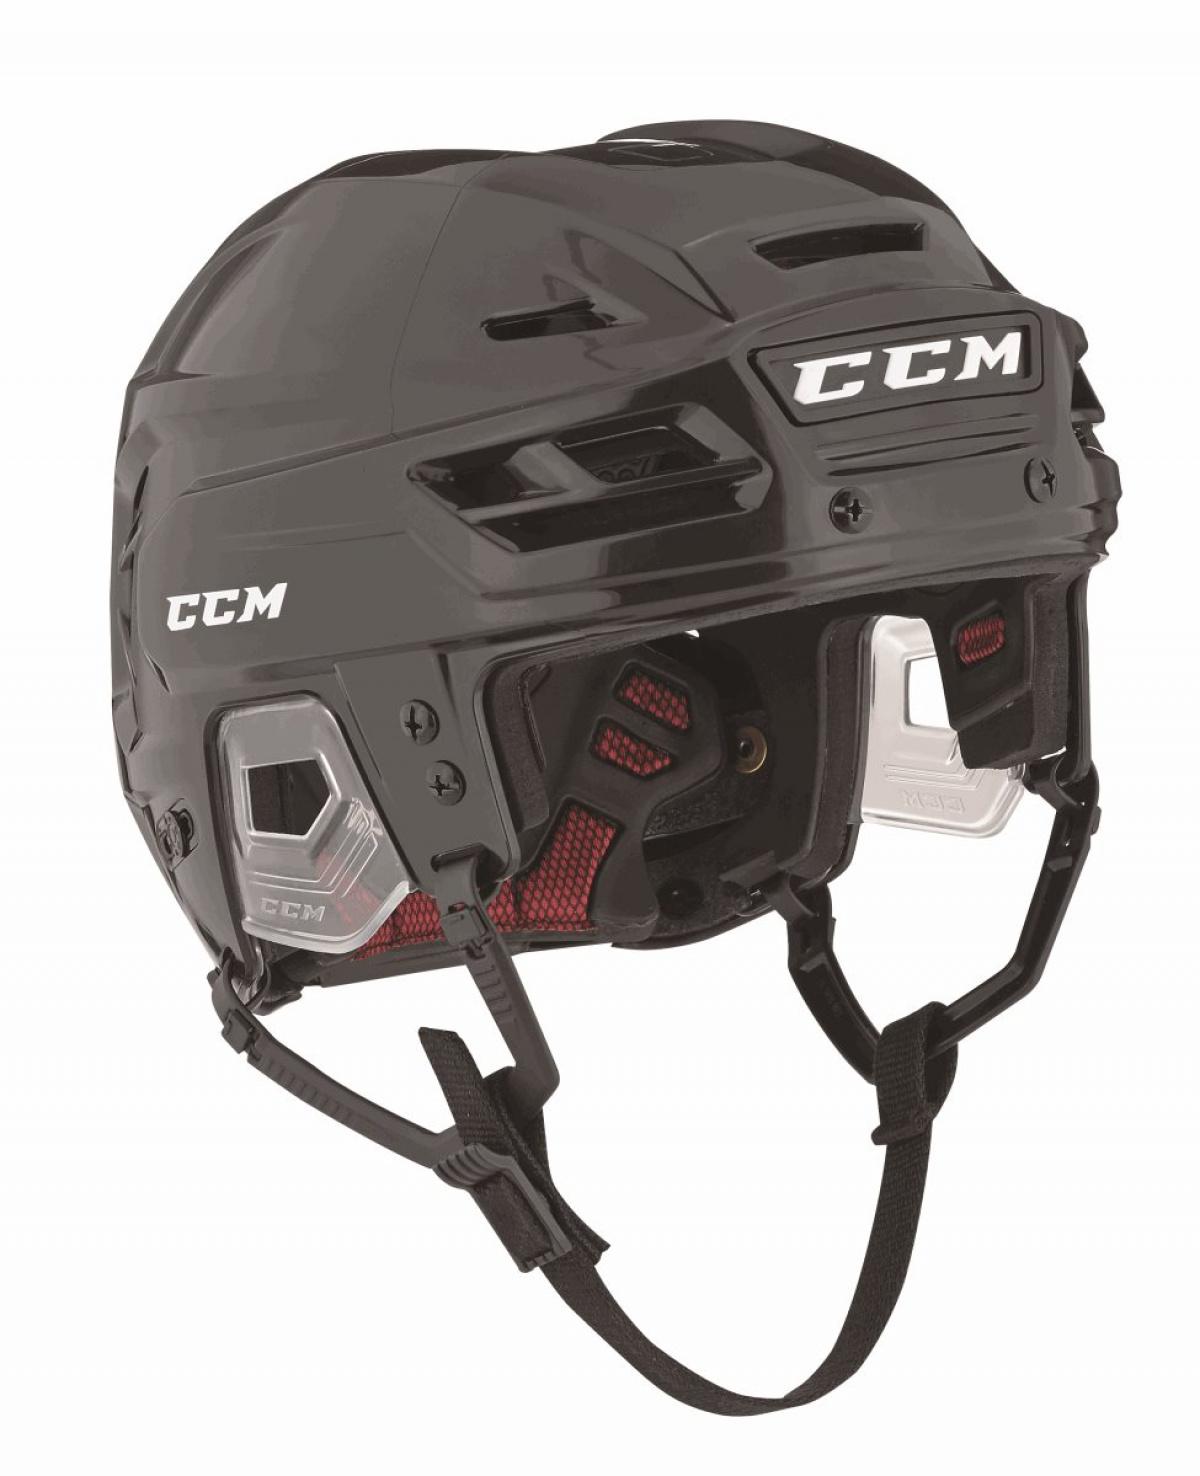 CCM R300 Ice Hockey Helmet